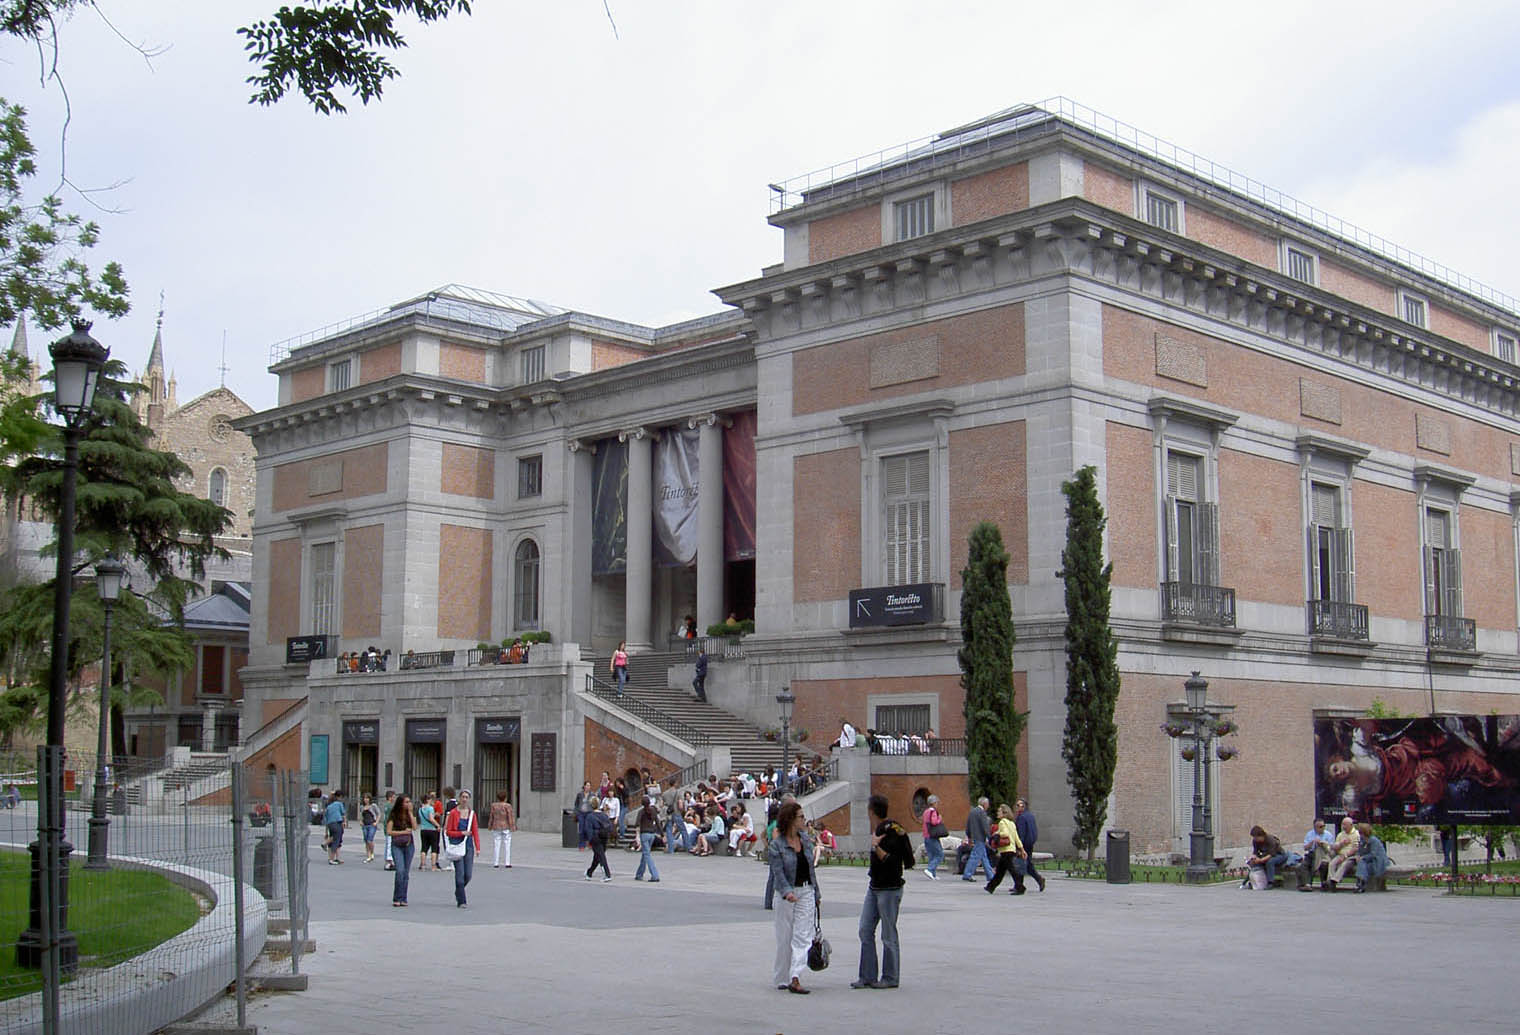 Clara peeters llega al museo del prado blog gavir for Calle del prado 9 madrid espana